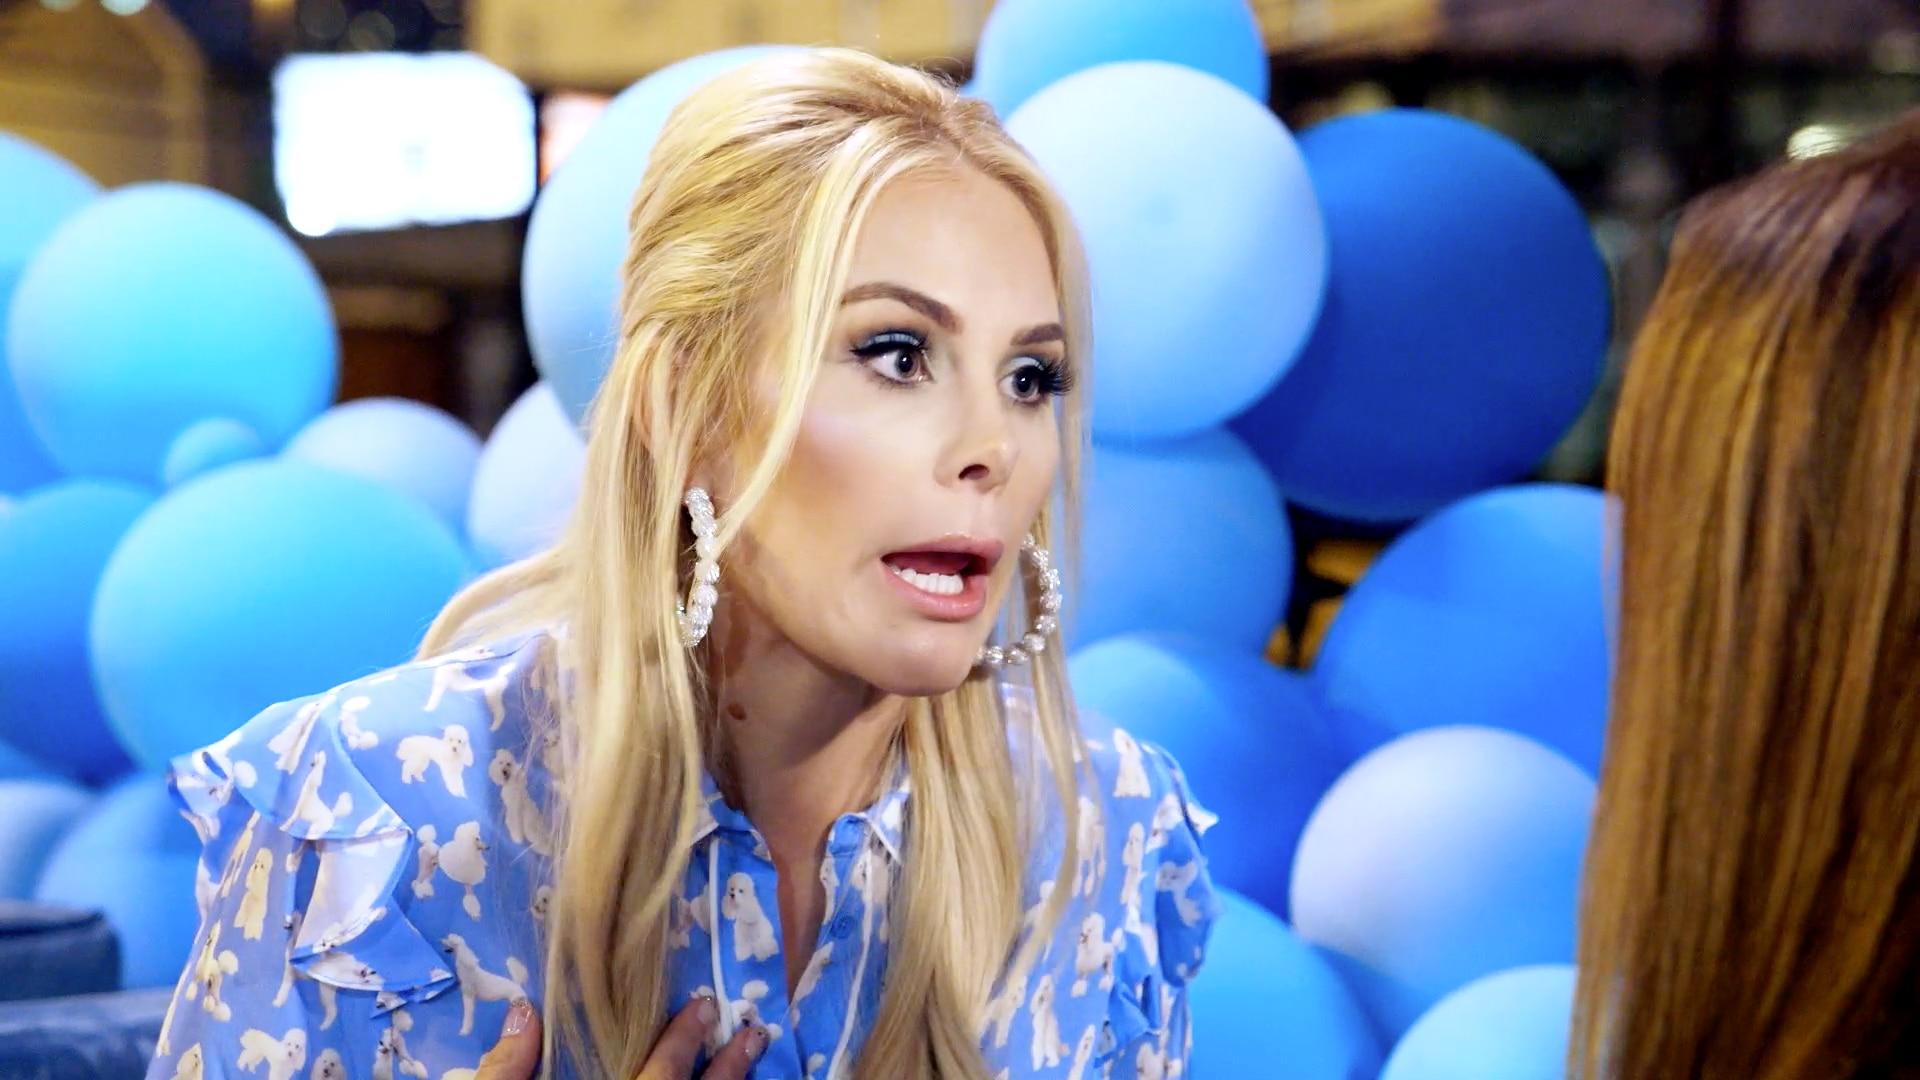 Watch The Real Housewives of Dallas Sneak Peek: Is LeeAnne